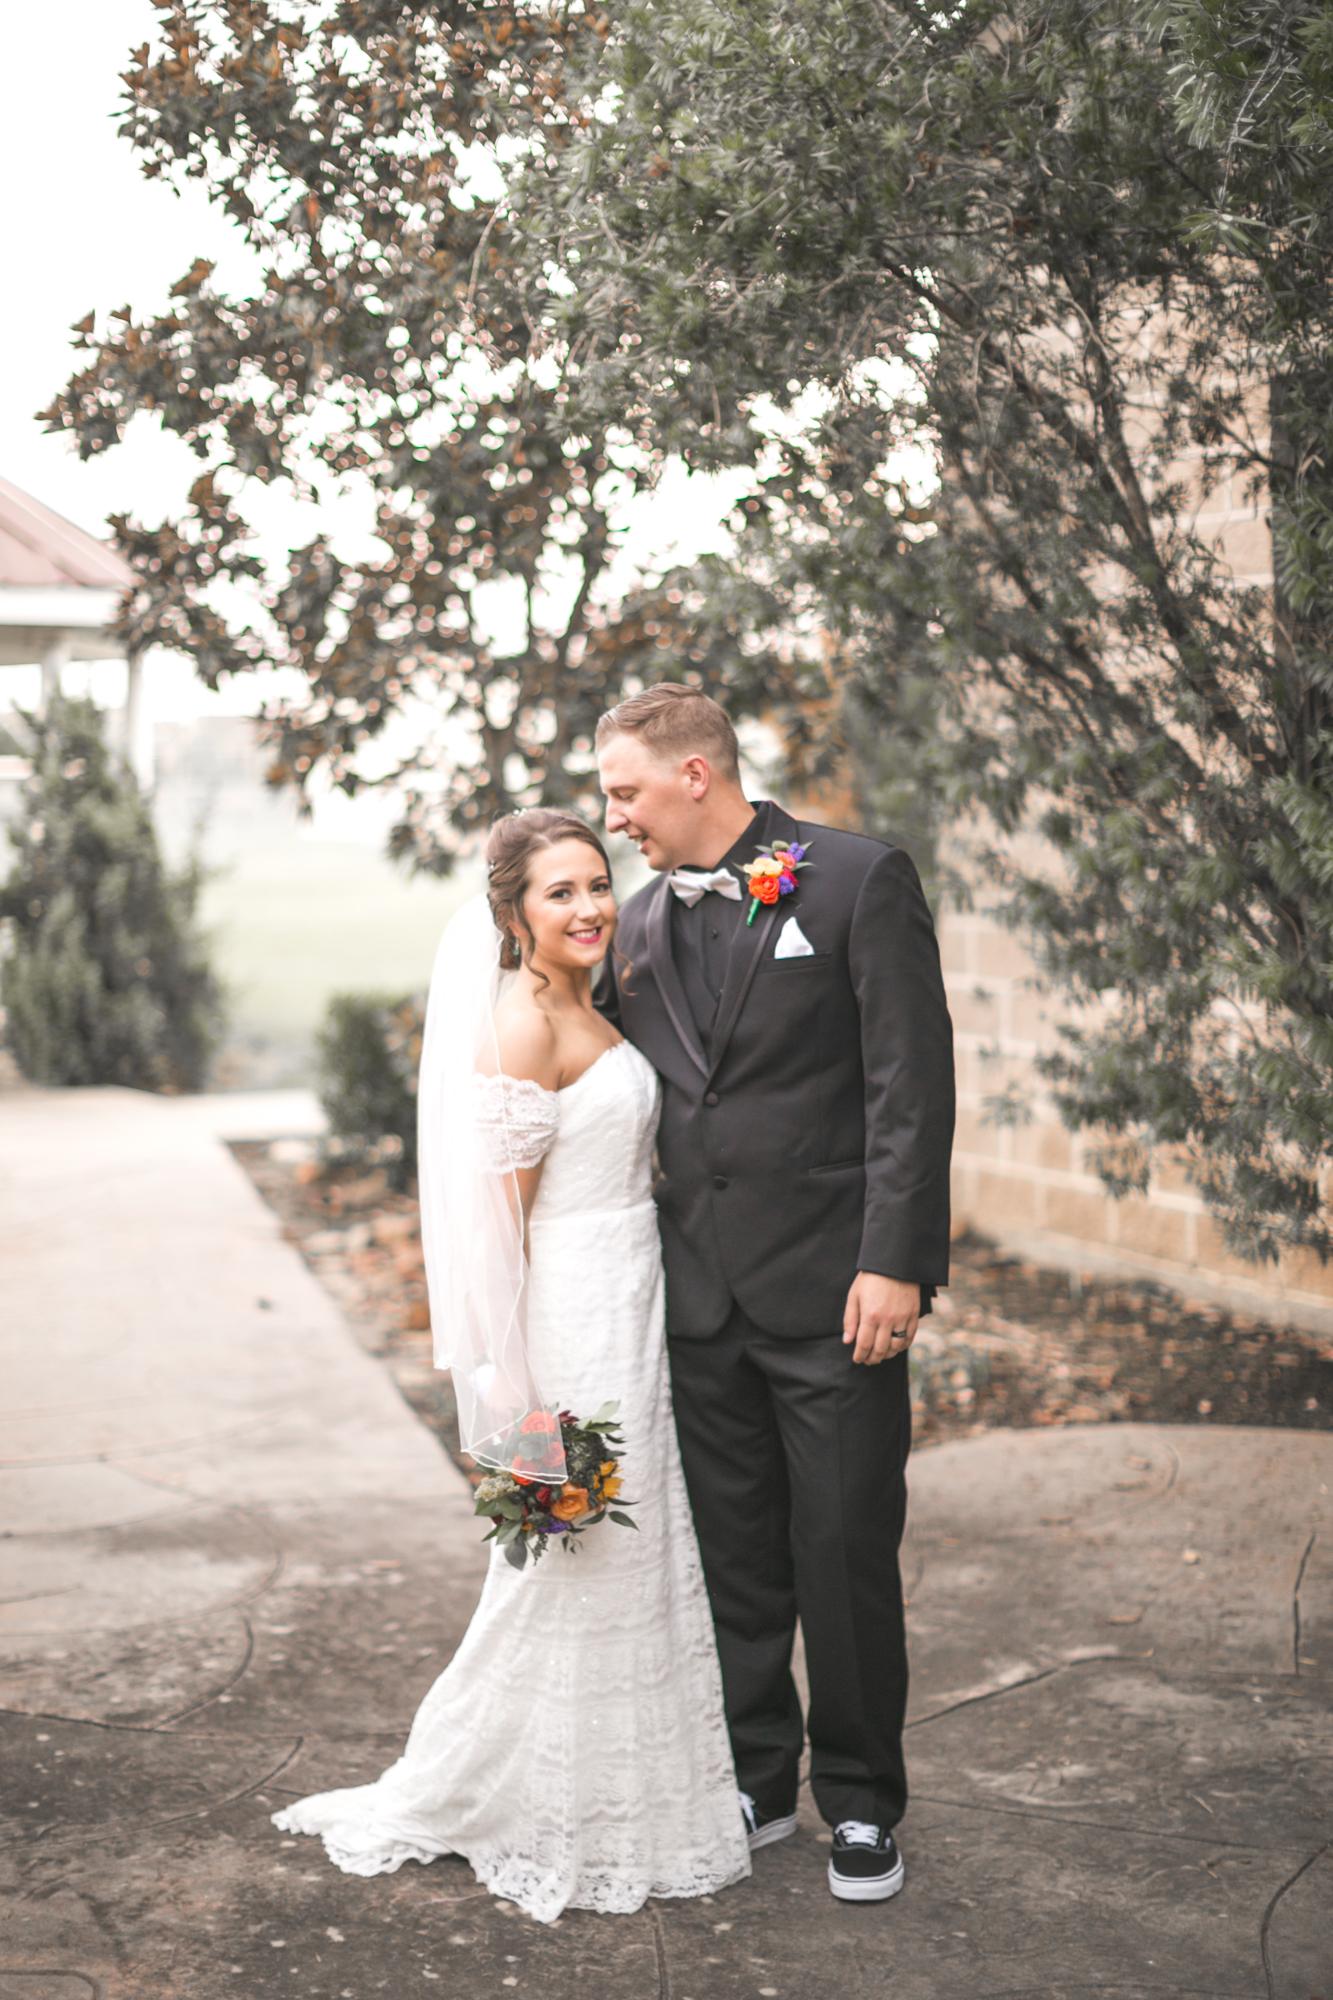 Seymour-Matte Wedding-6.jpg